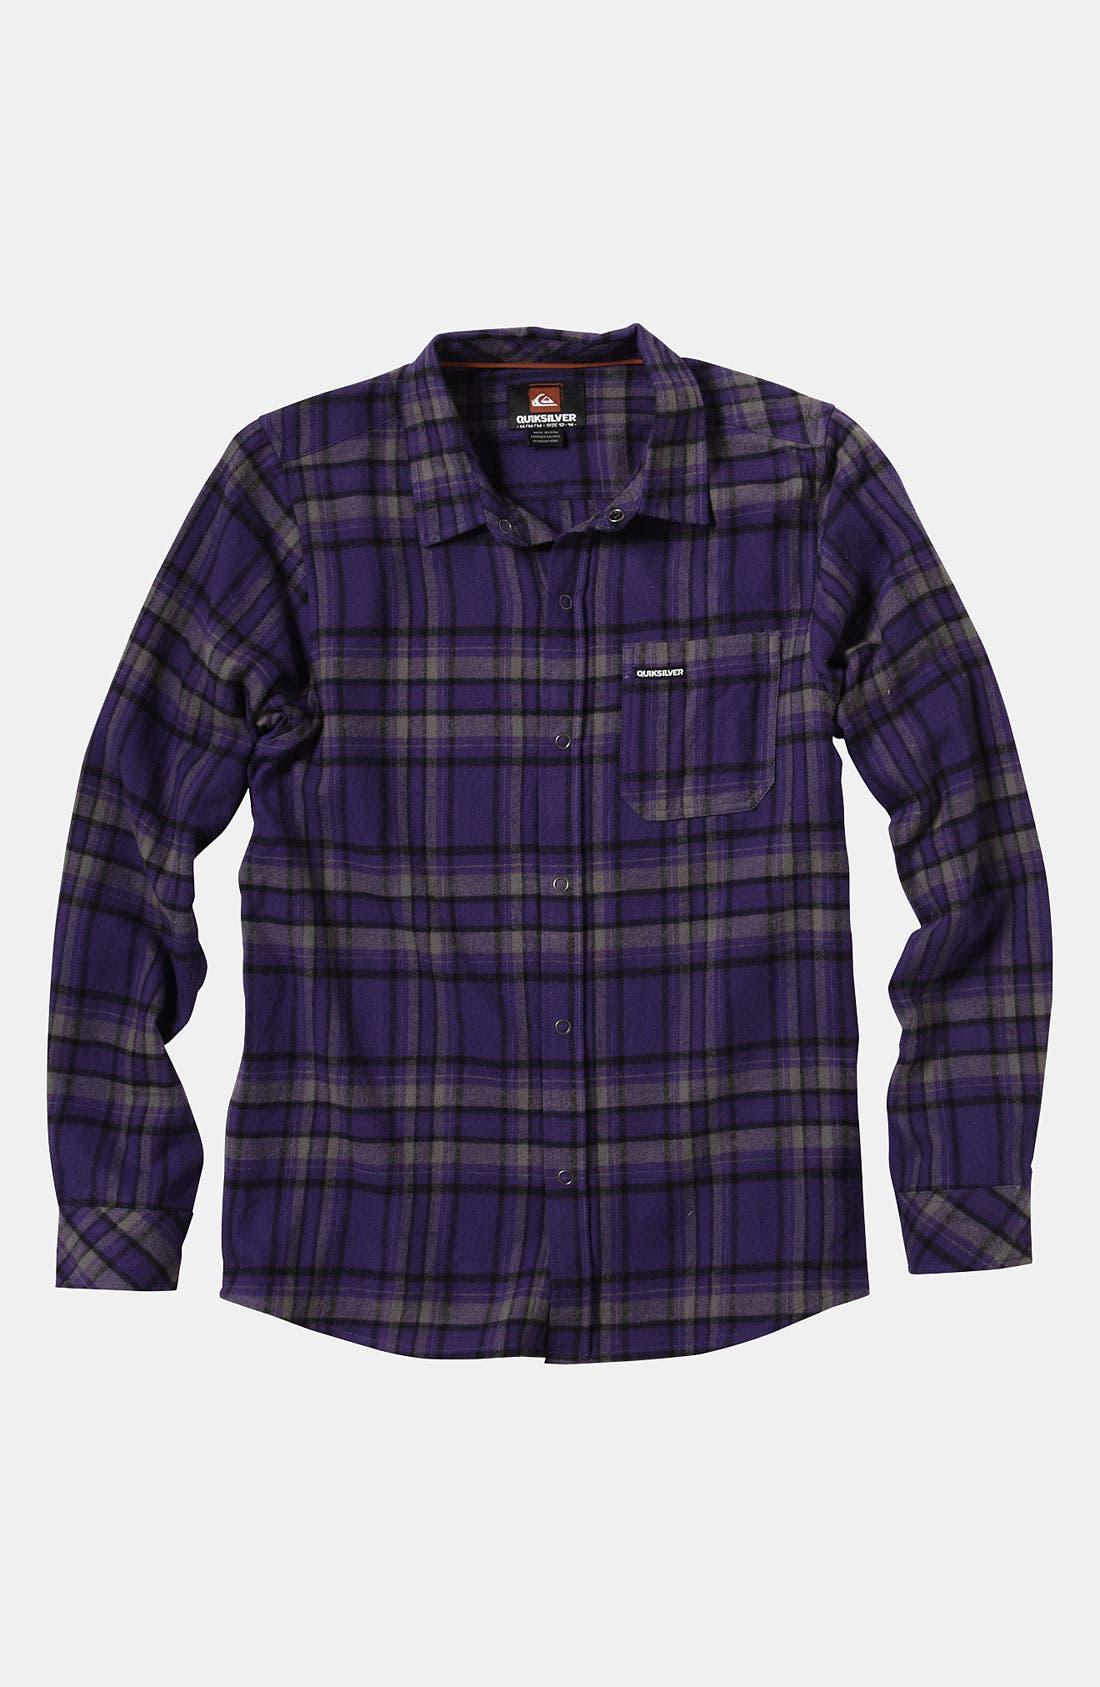 Alternate Image 1 Selected - Quiksilver 'Bunga Bunga' Woven Shirt (Big Boys)